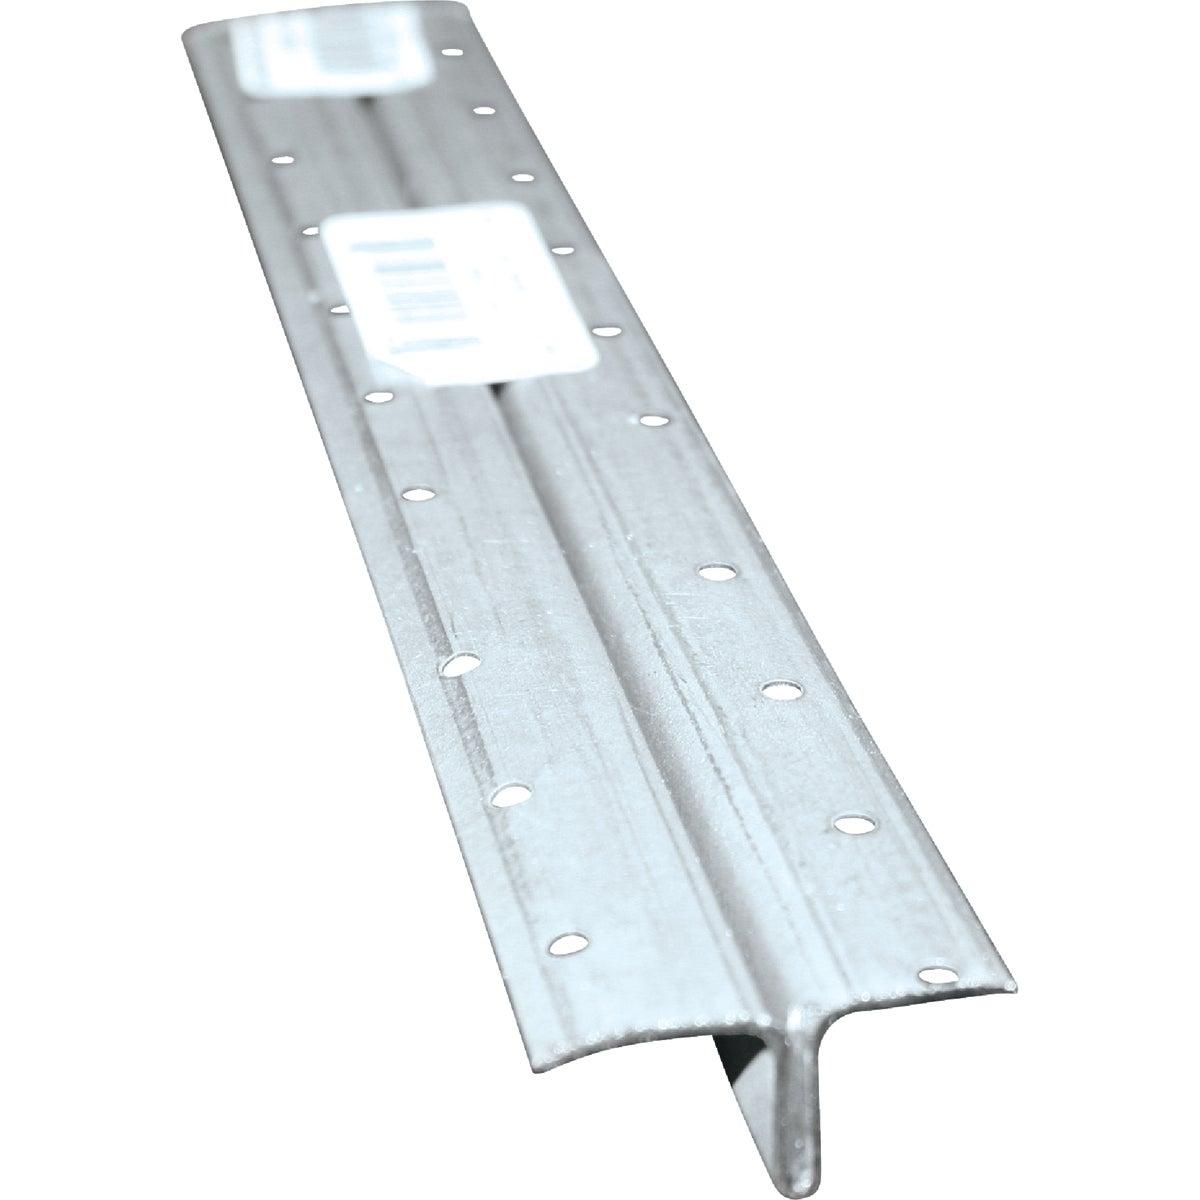 Klauer Manufacturing SAW KERF T WALL BRACING 55510-GV10